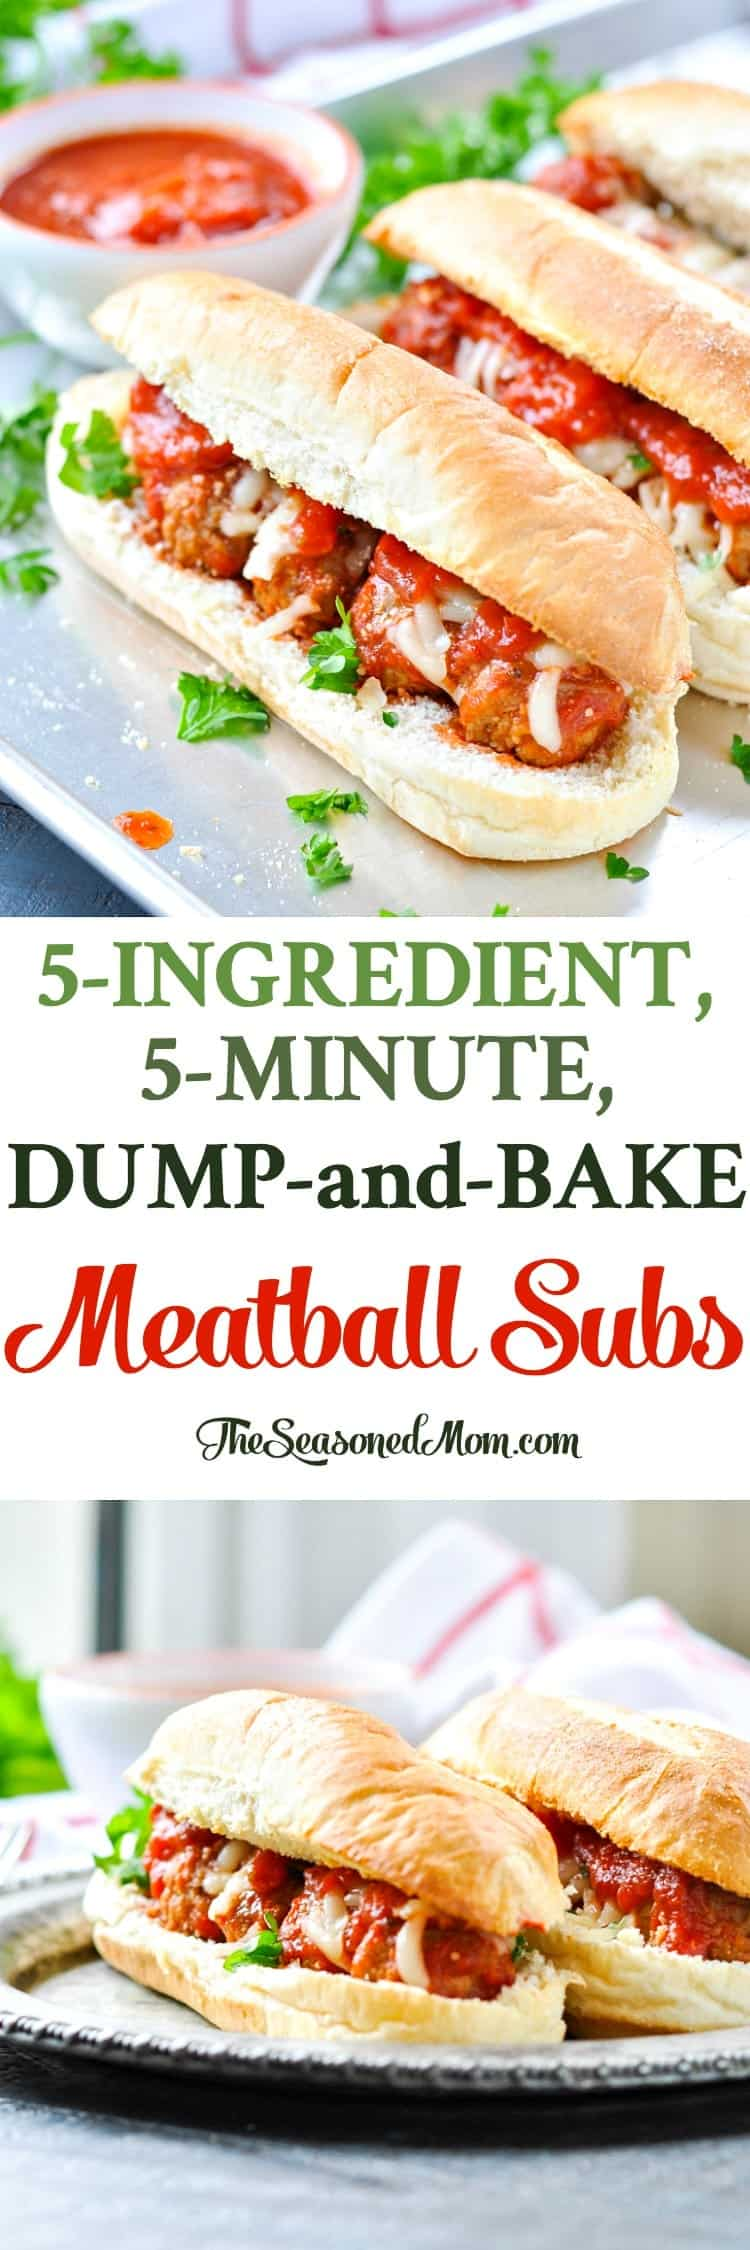 5-Ingredient Dump-and-Bake Meatball Subs - The Seasoned Mom